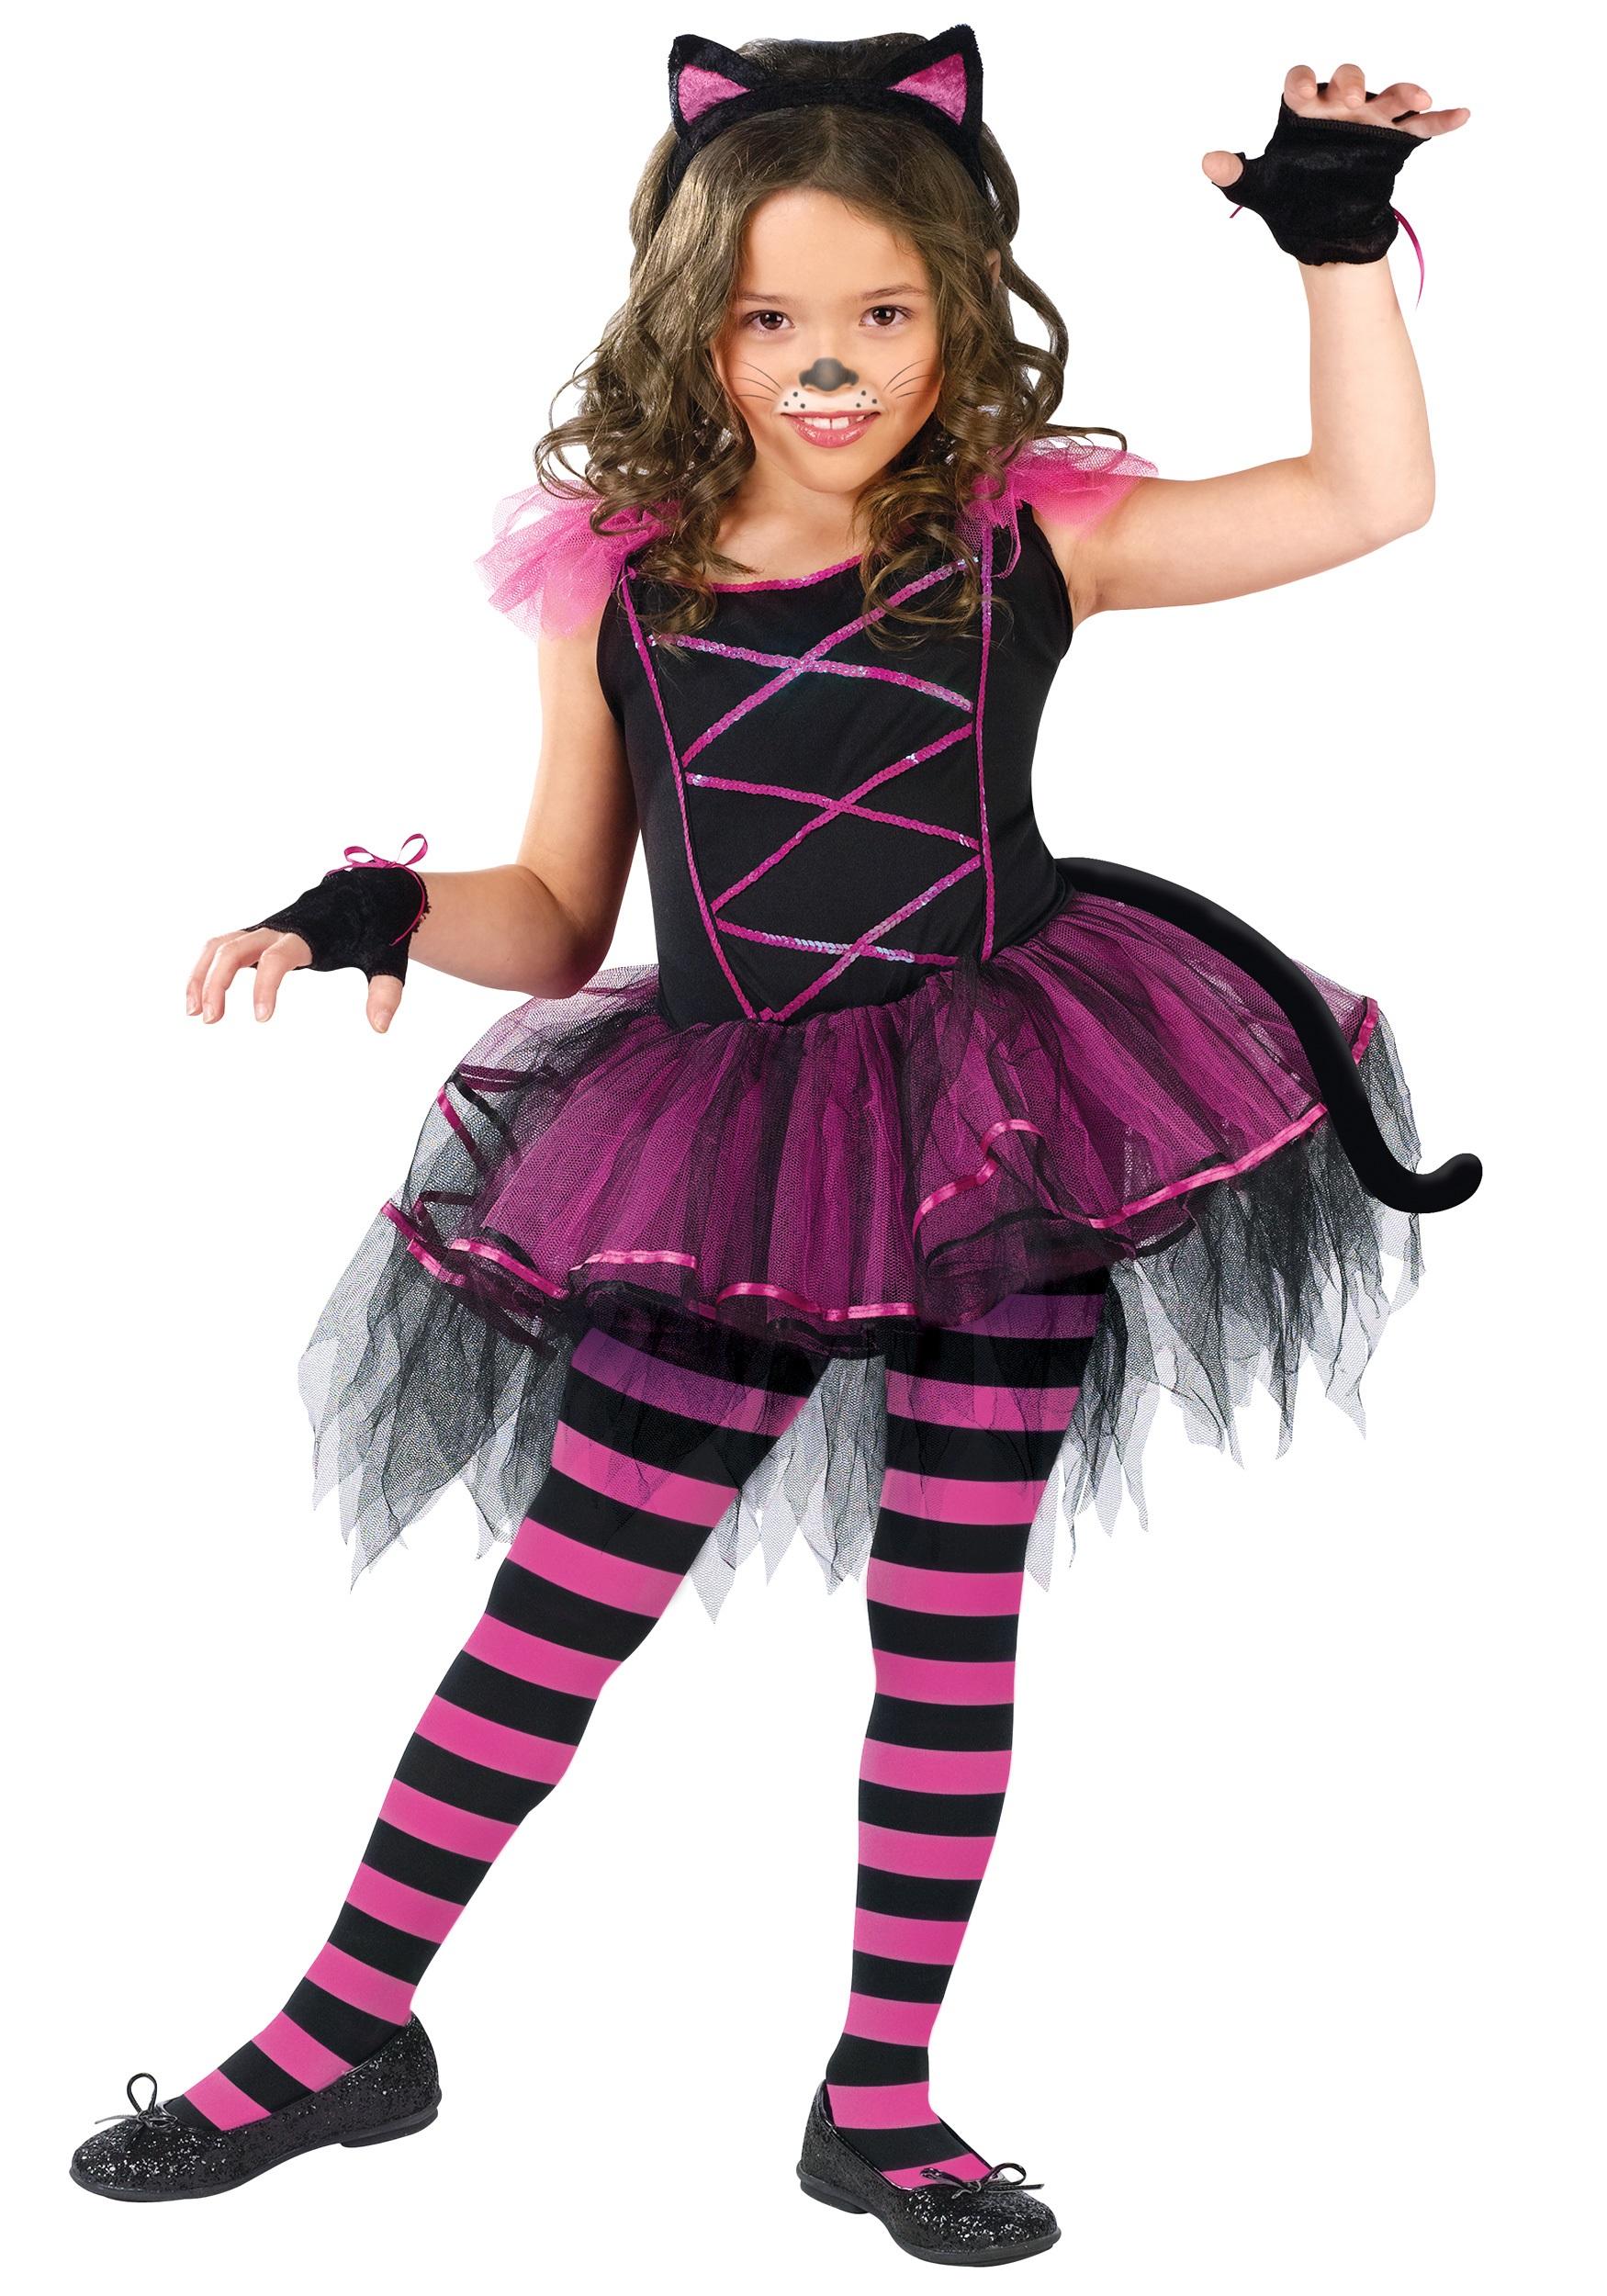 Girls Caterina Ballerina Costume  sc 1 st  Halloween Costume & Girls Caterina Ballerina Costume - Tutu Halloween Costumes for kids